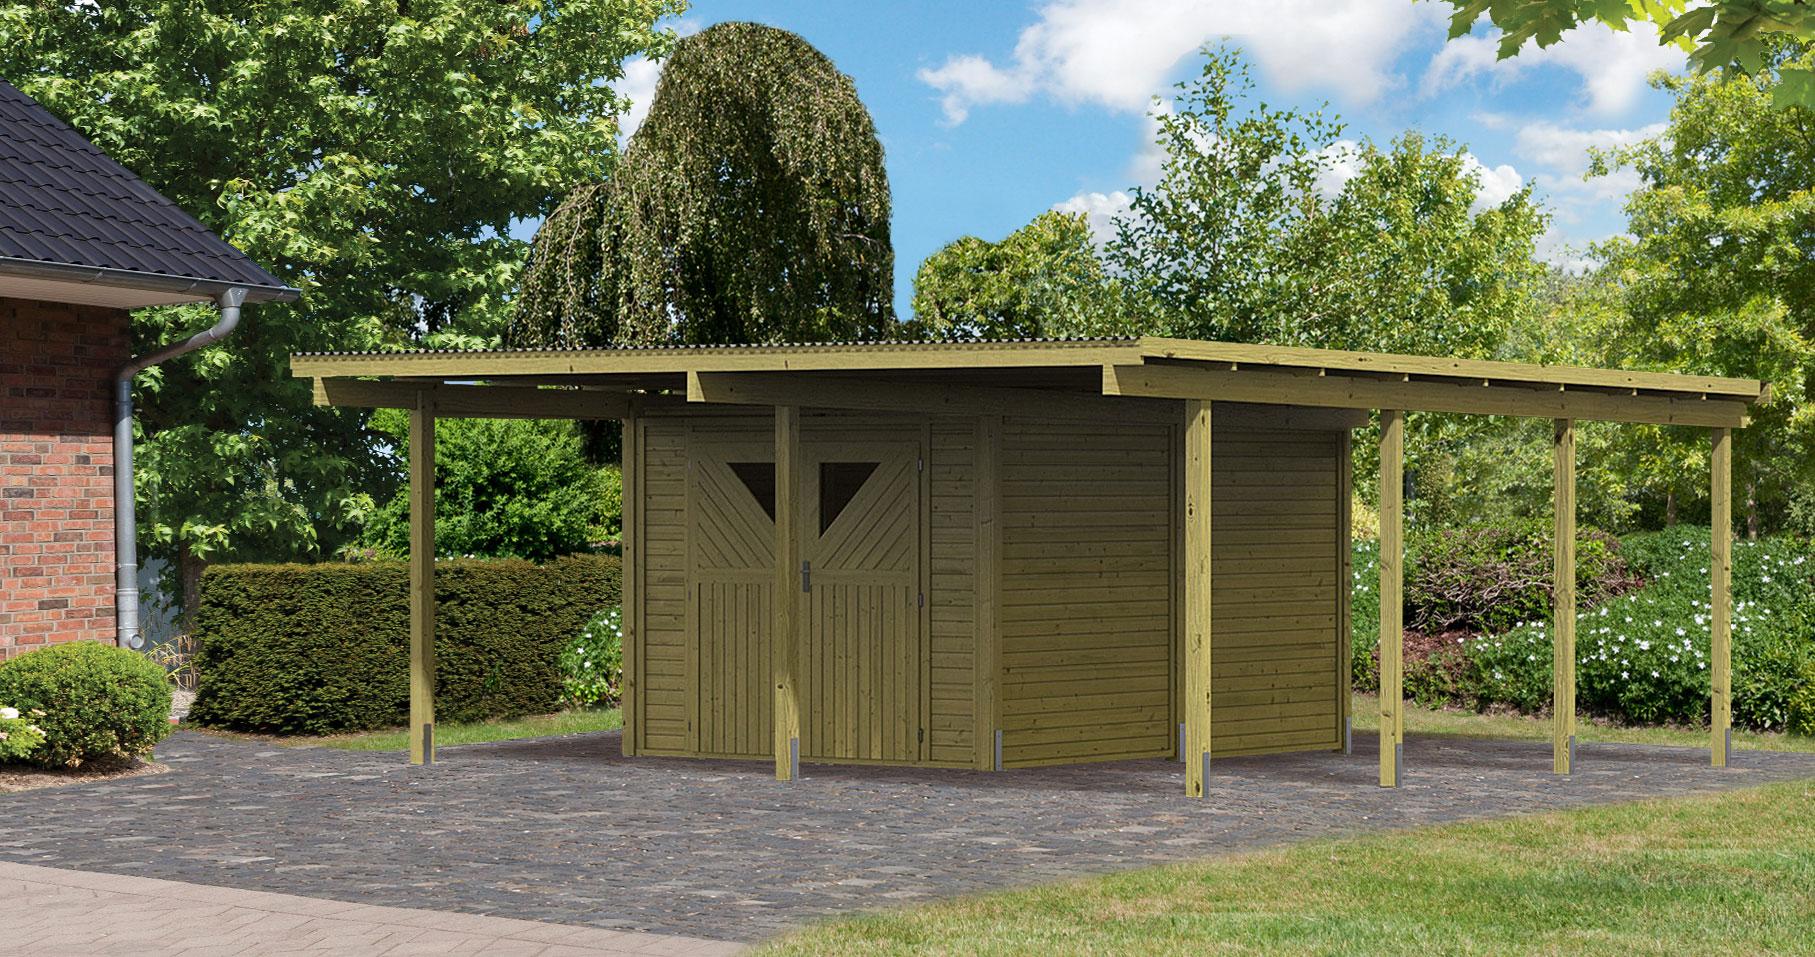 karibu eco carport mit abstellraum 2 kdi 563x676cm bei. Black Bedroom Furniture Sets. Home Design Ideas